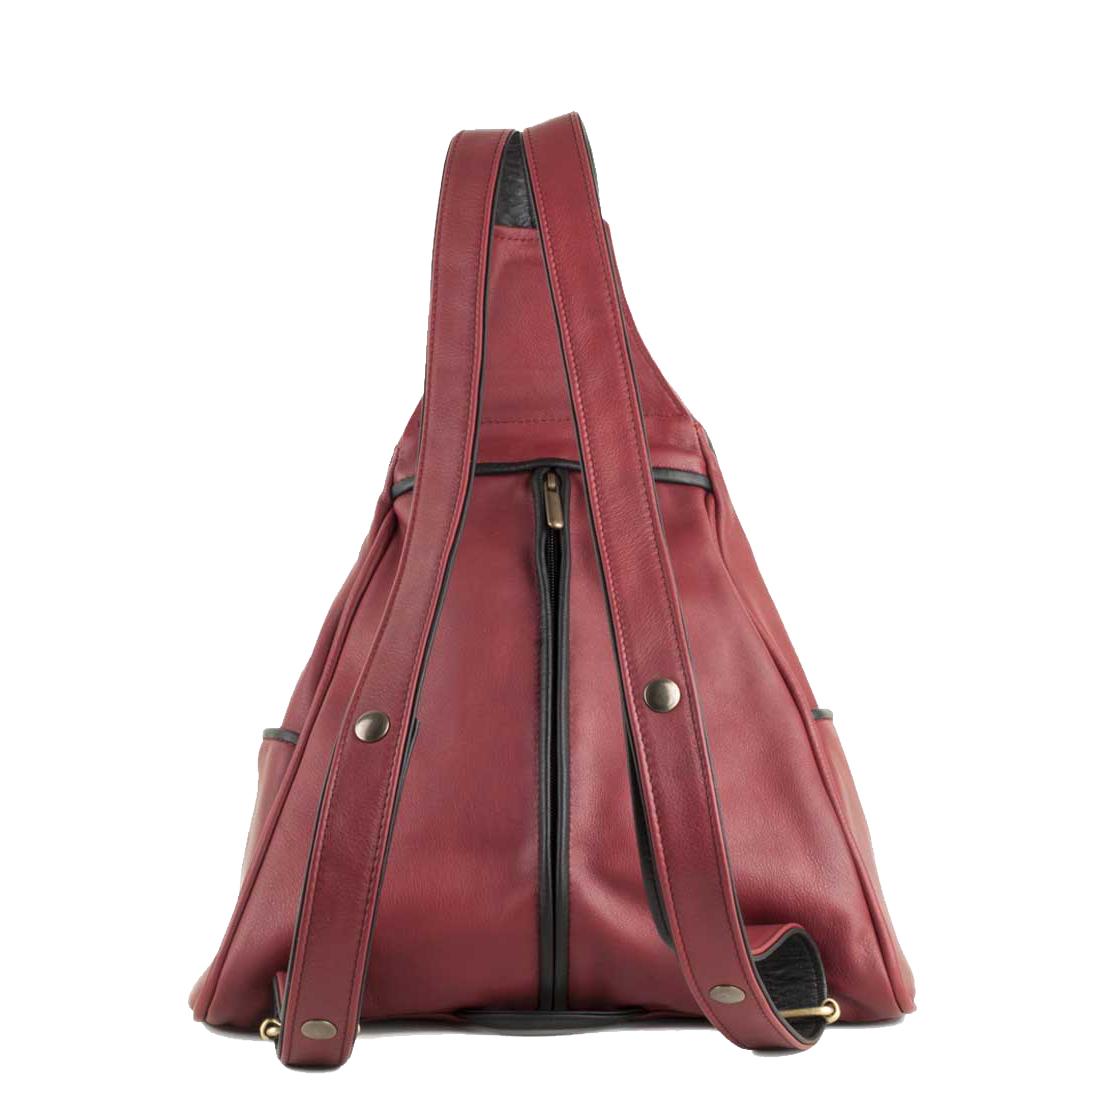 Saddlebag Red Leather Backpack